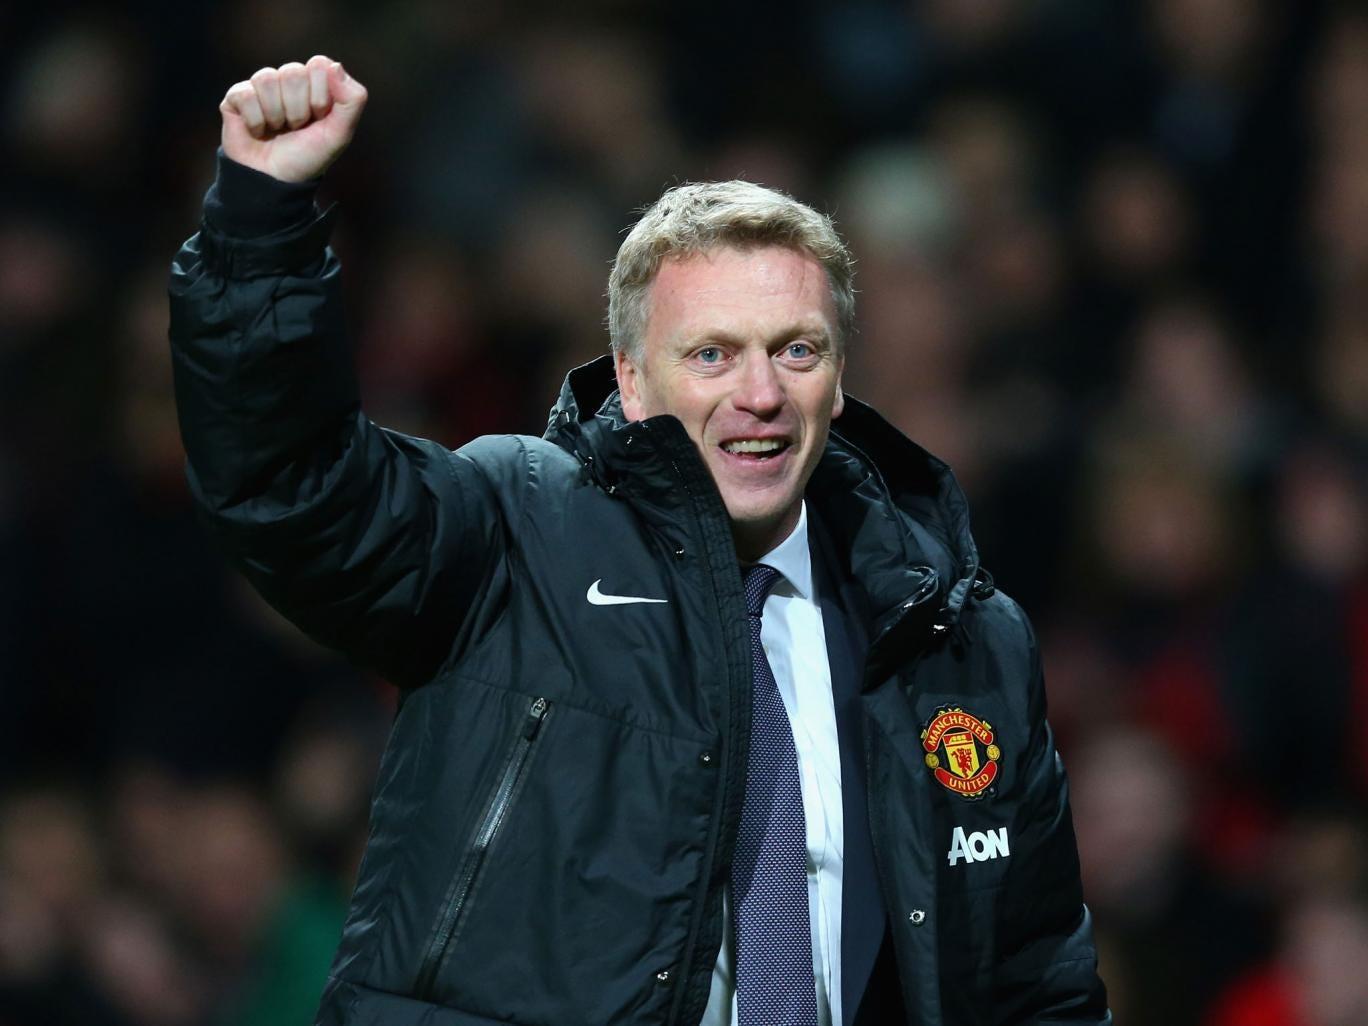 Manchester United manager David Moyes celebrates victory over Arsenal